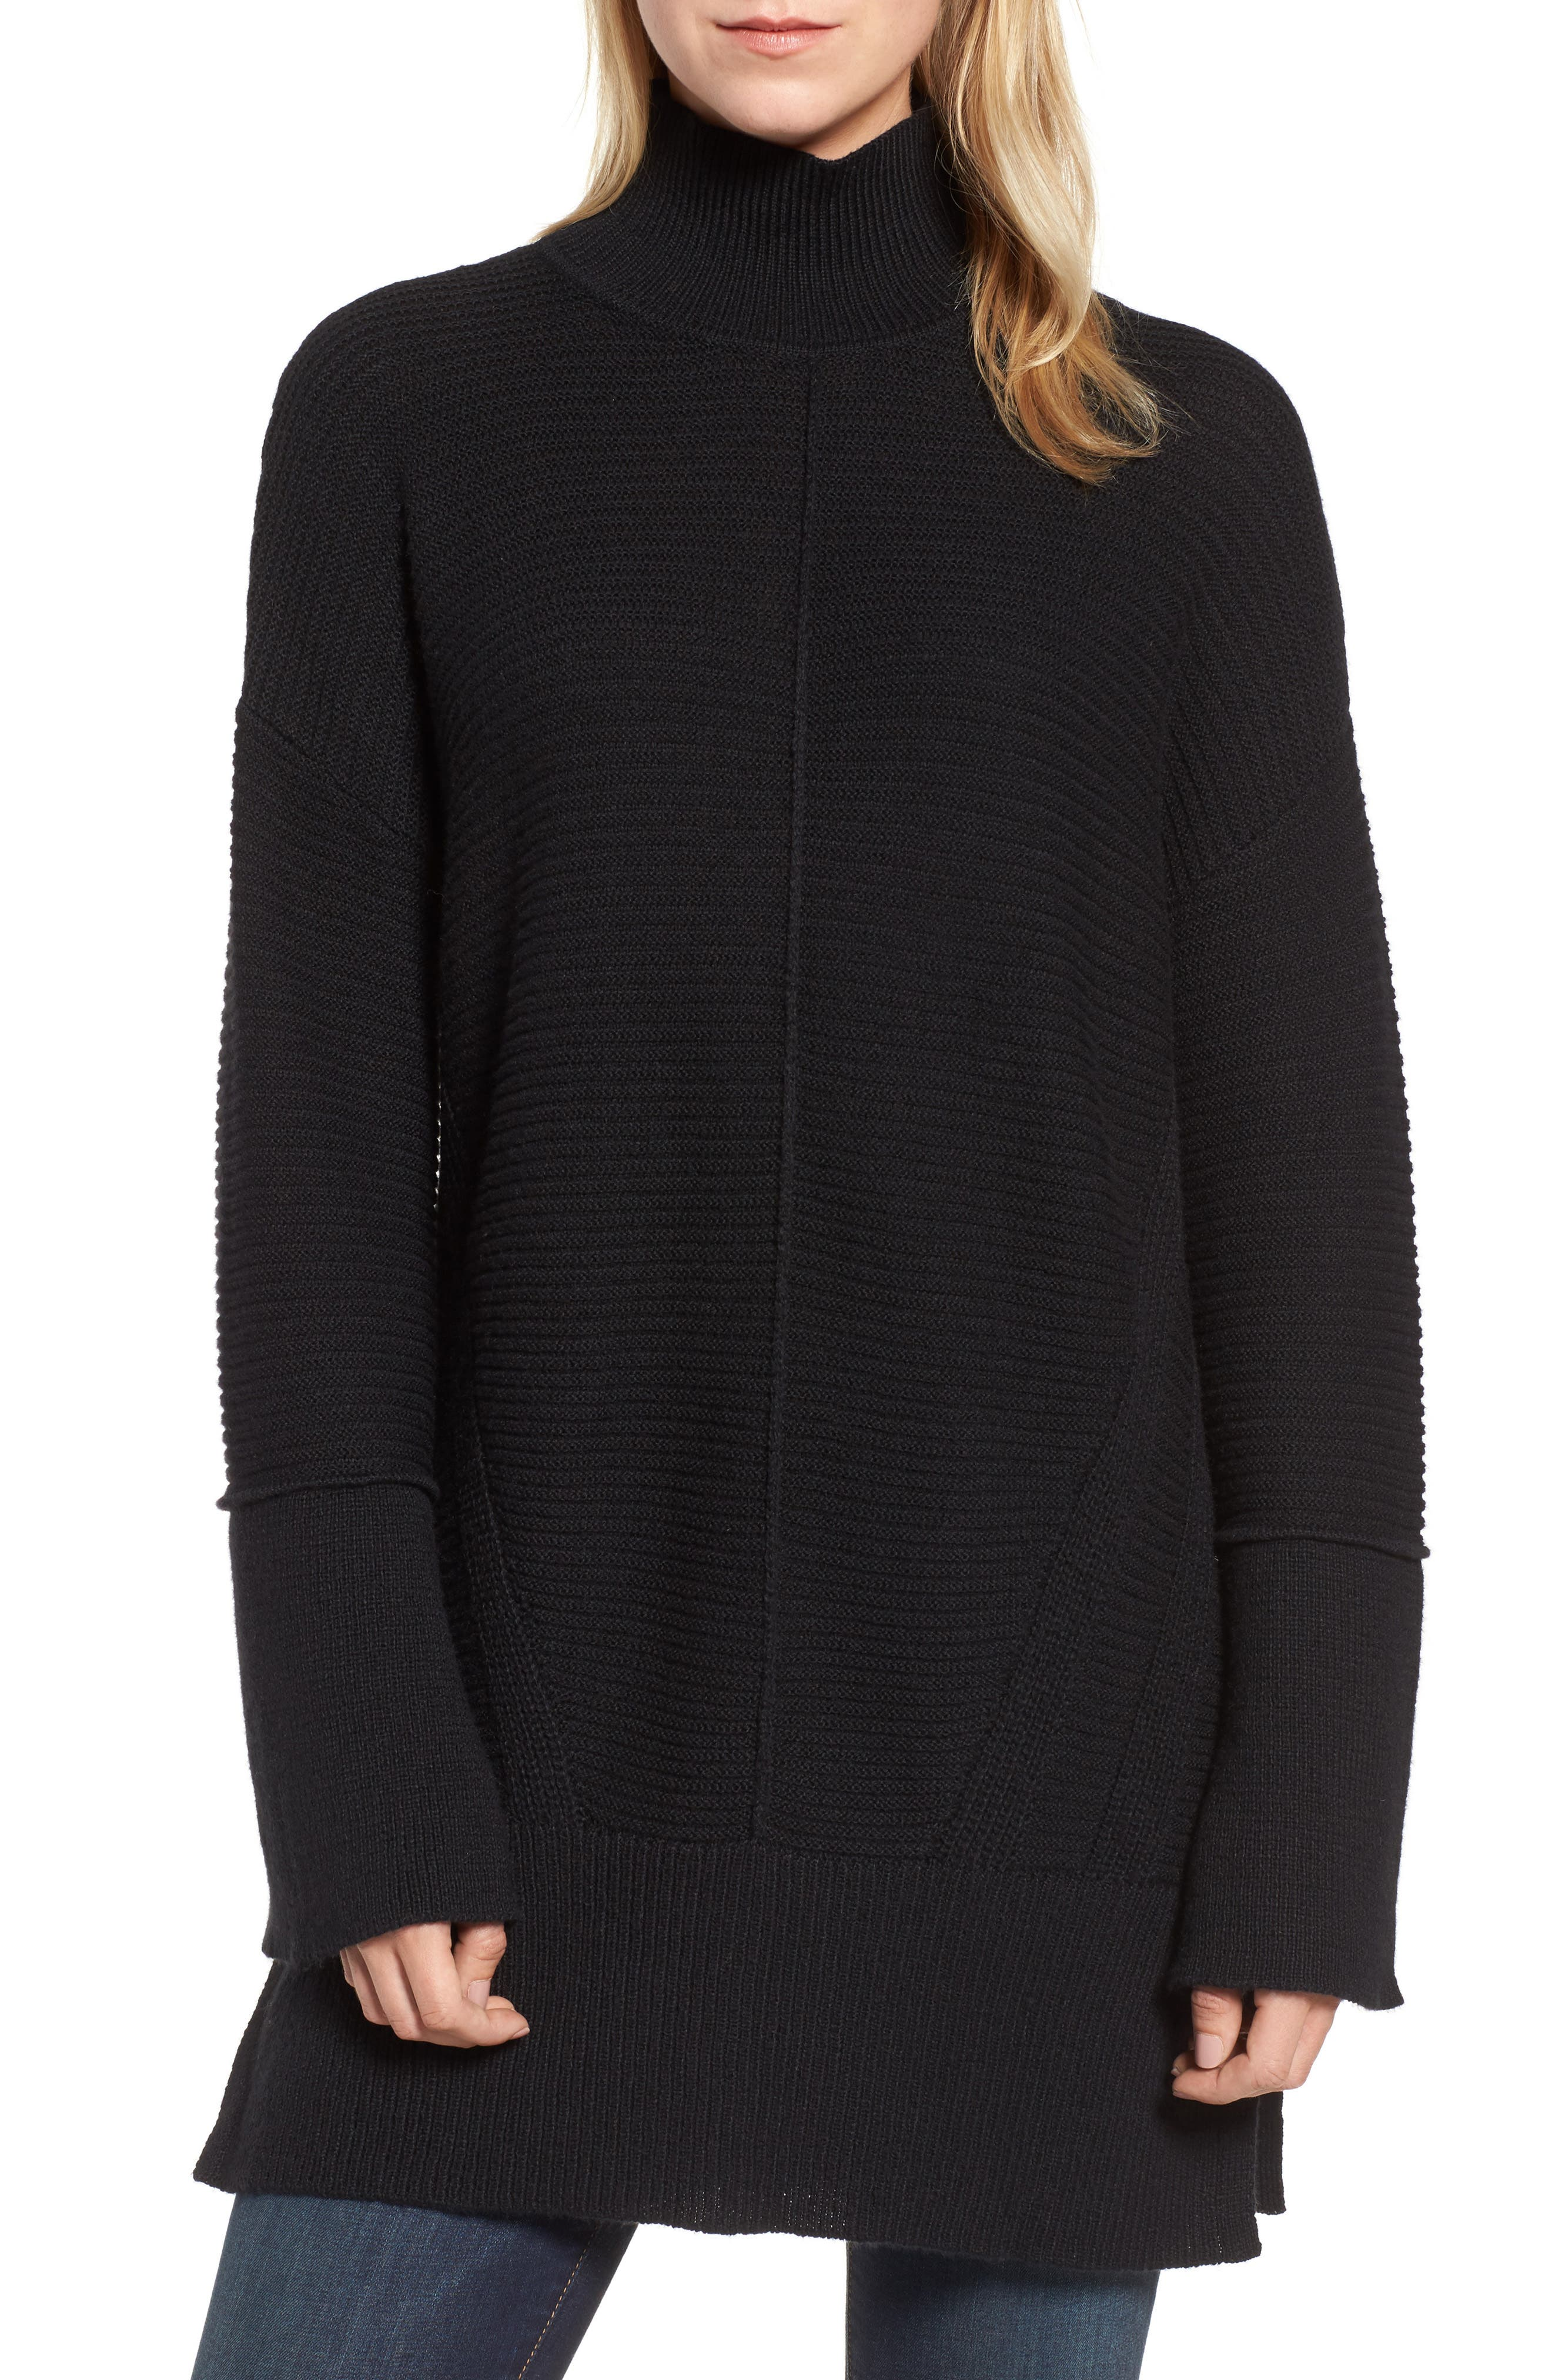 Ribbed Turtleneck Tunic Sweater,                             Main thumbnail 1, color,                             BLACK